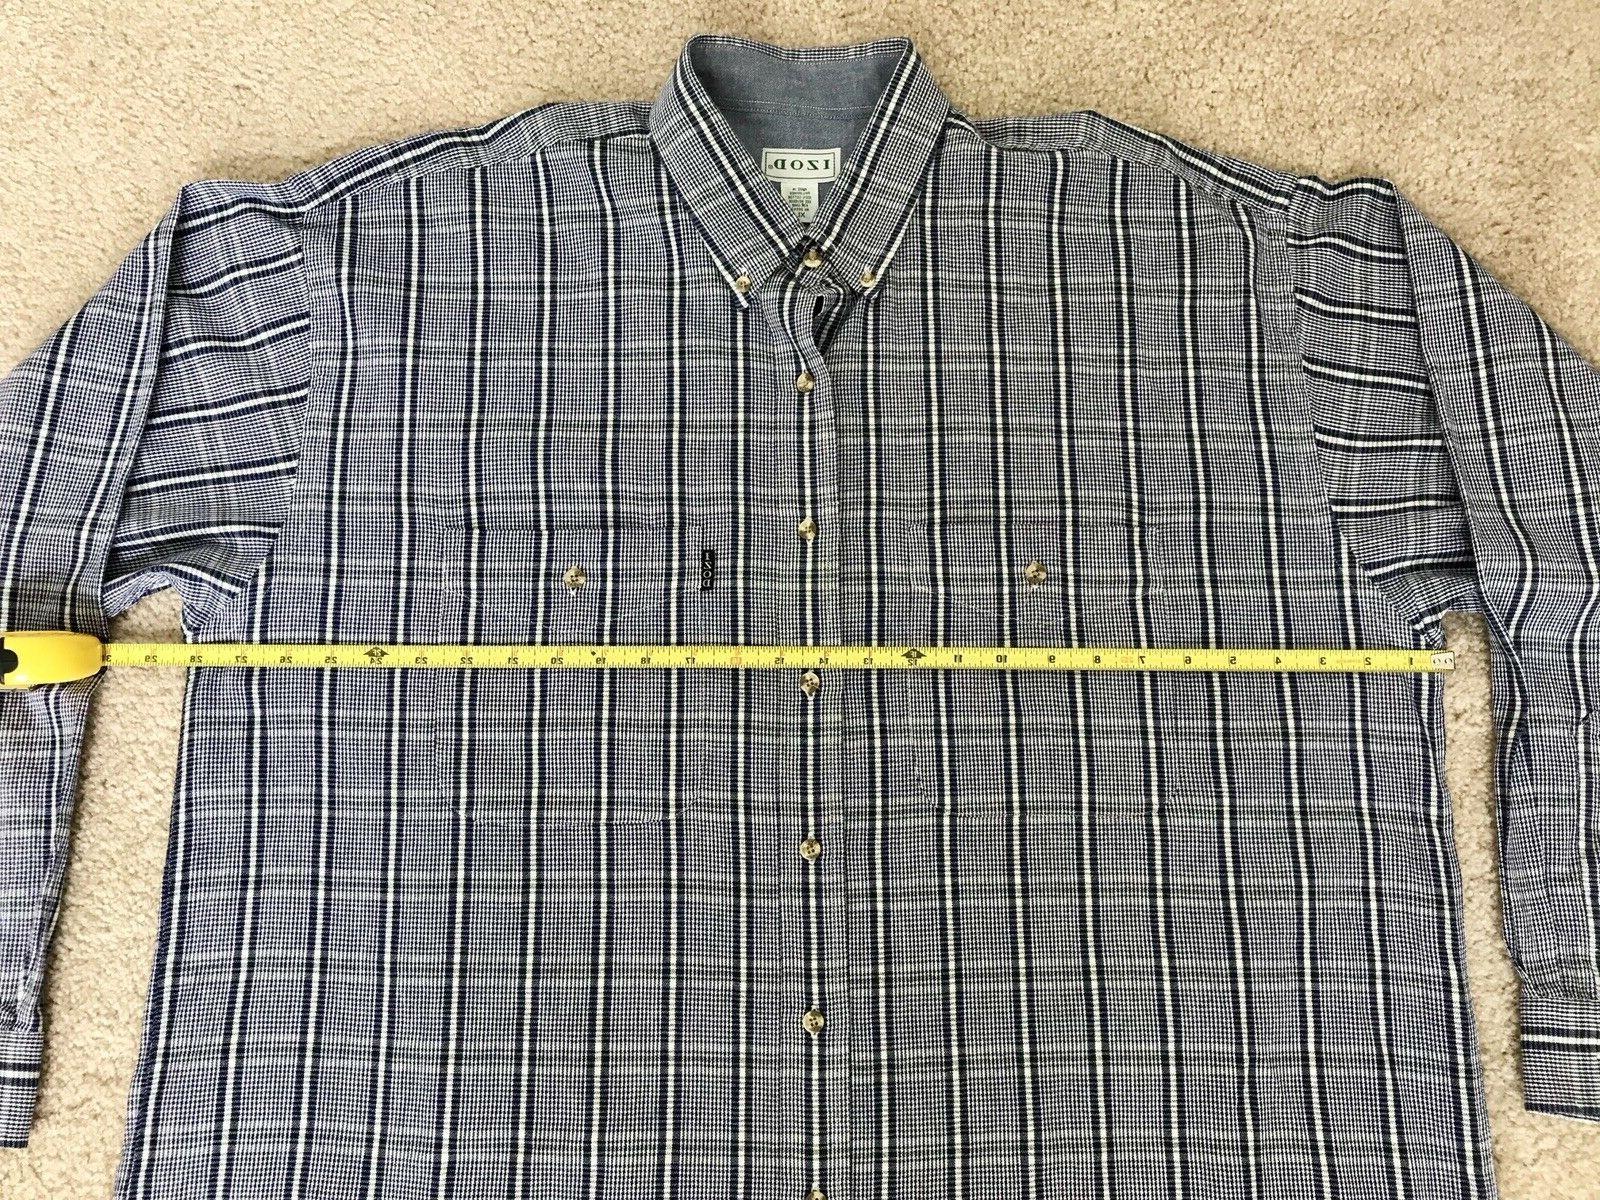 Izod Mens xl Long Sleeve ls Flannel shirt Cotton Blue Green Plaid euc